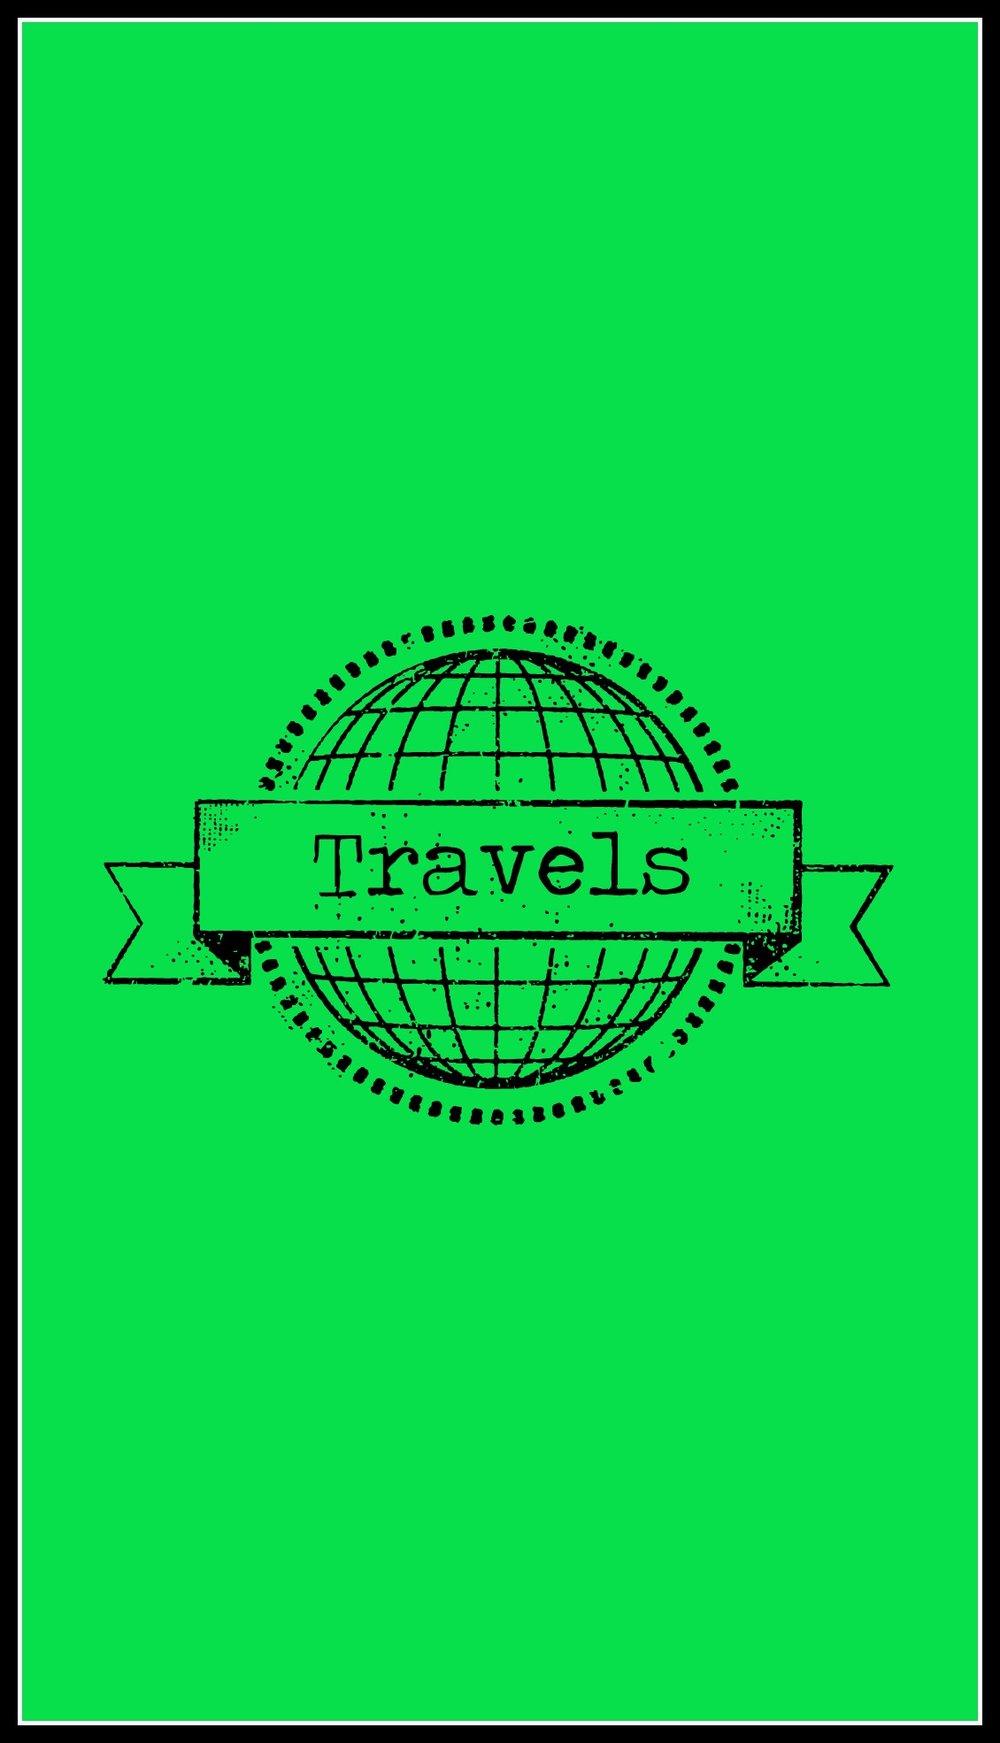 Instagram Travel Template - PrairieTaleTravels